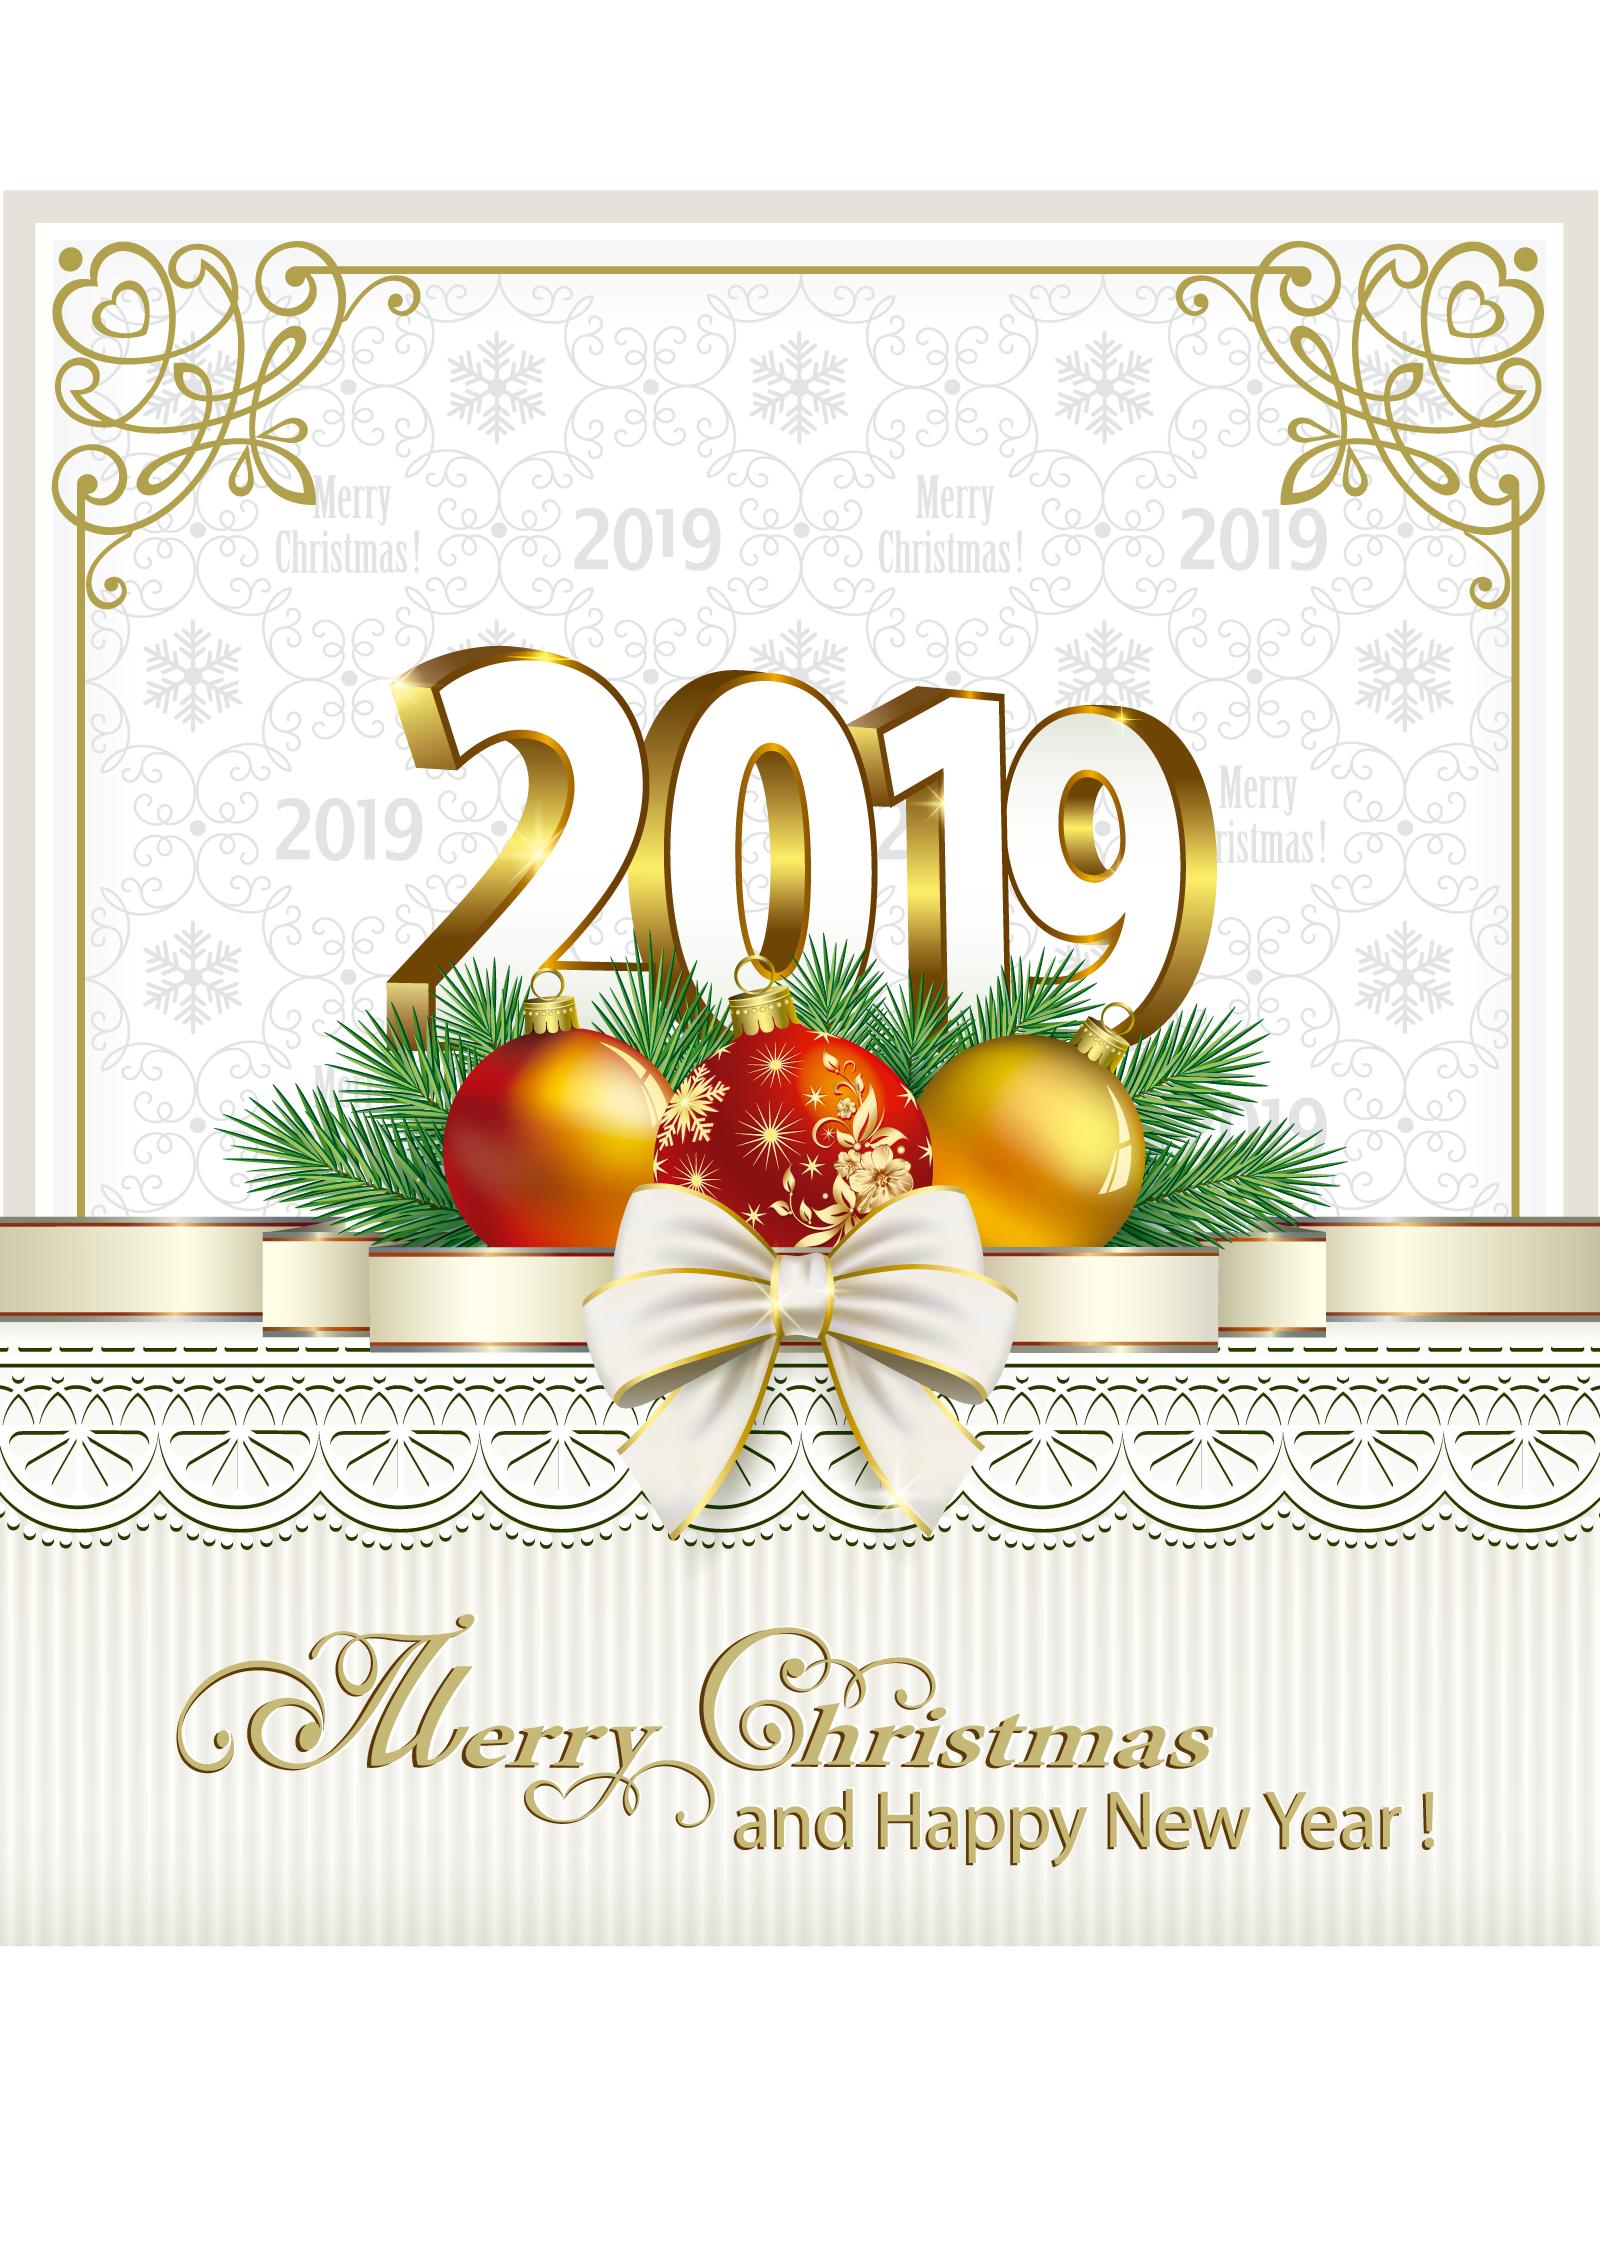 Festividades LES & Ae_L V.G. MS. 2018-2019